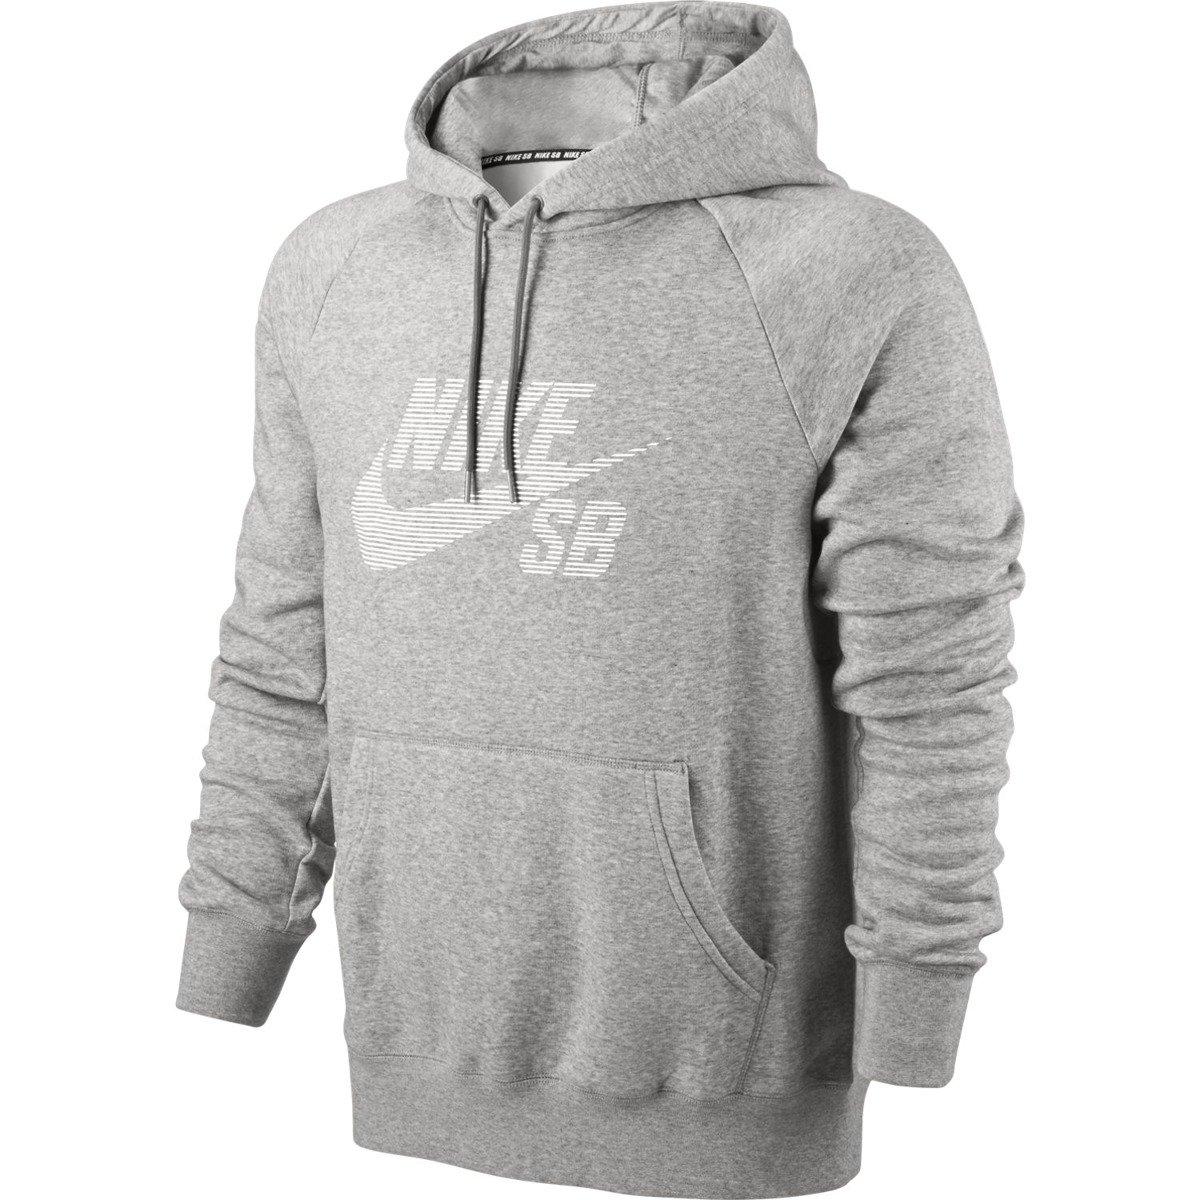 Bluza Nike sb tape crewneck